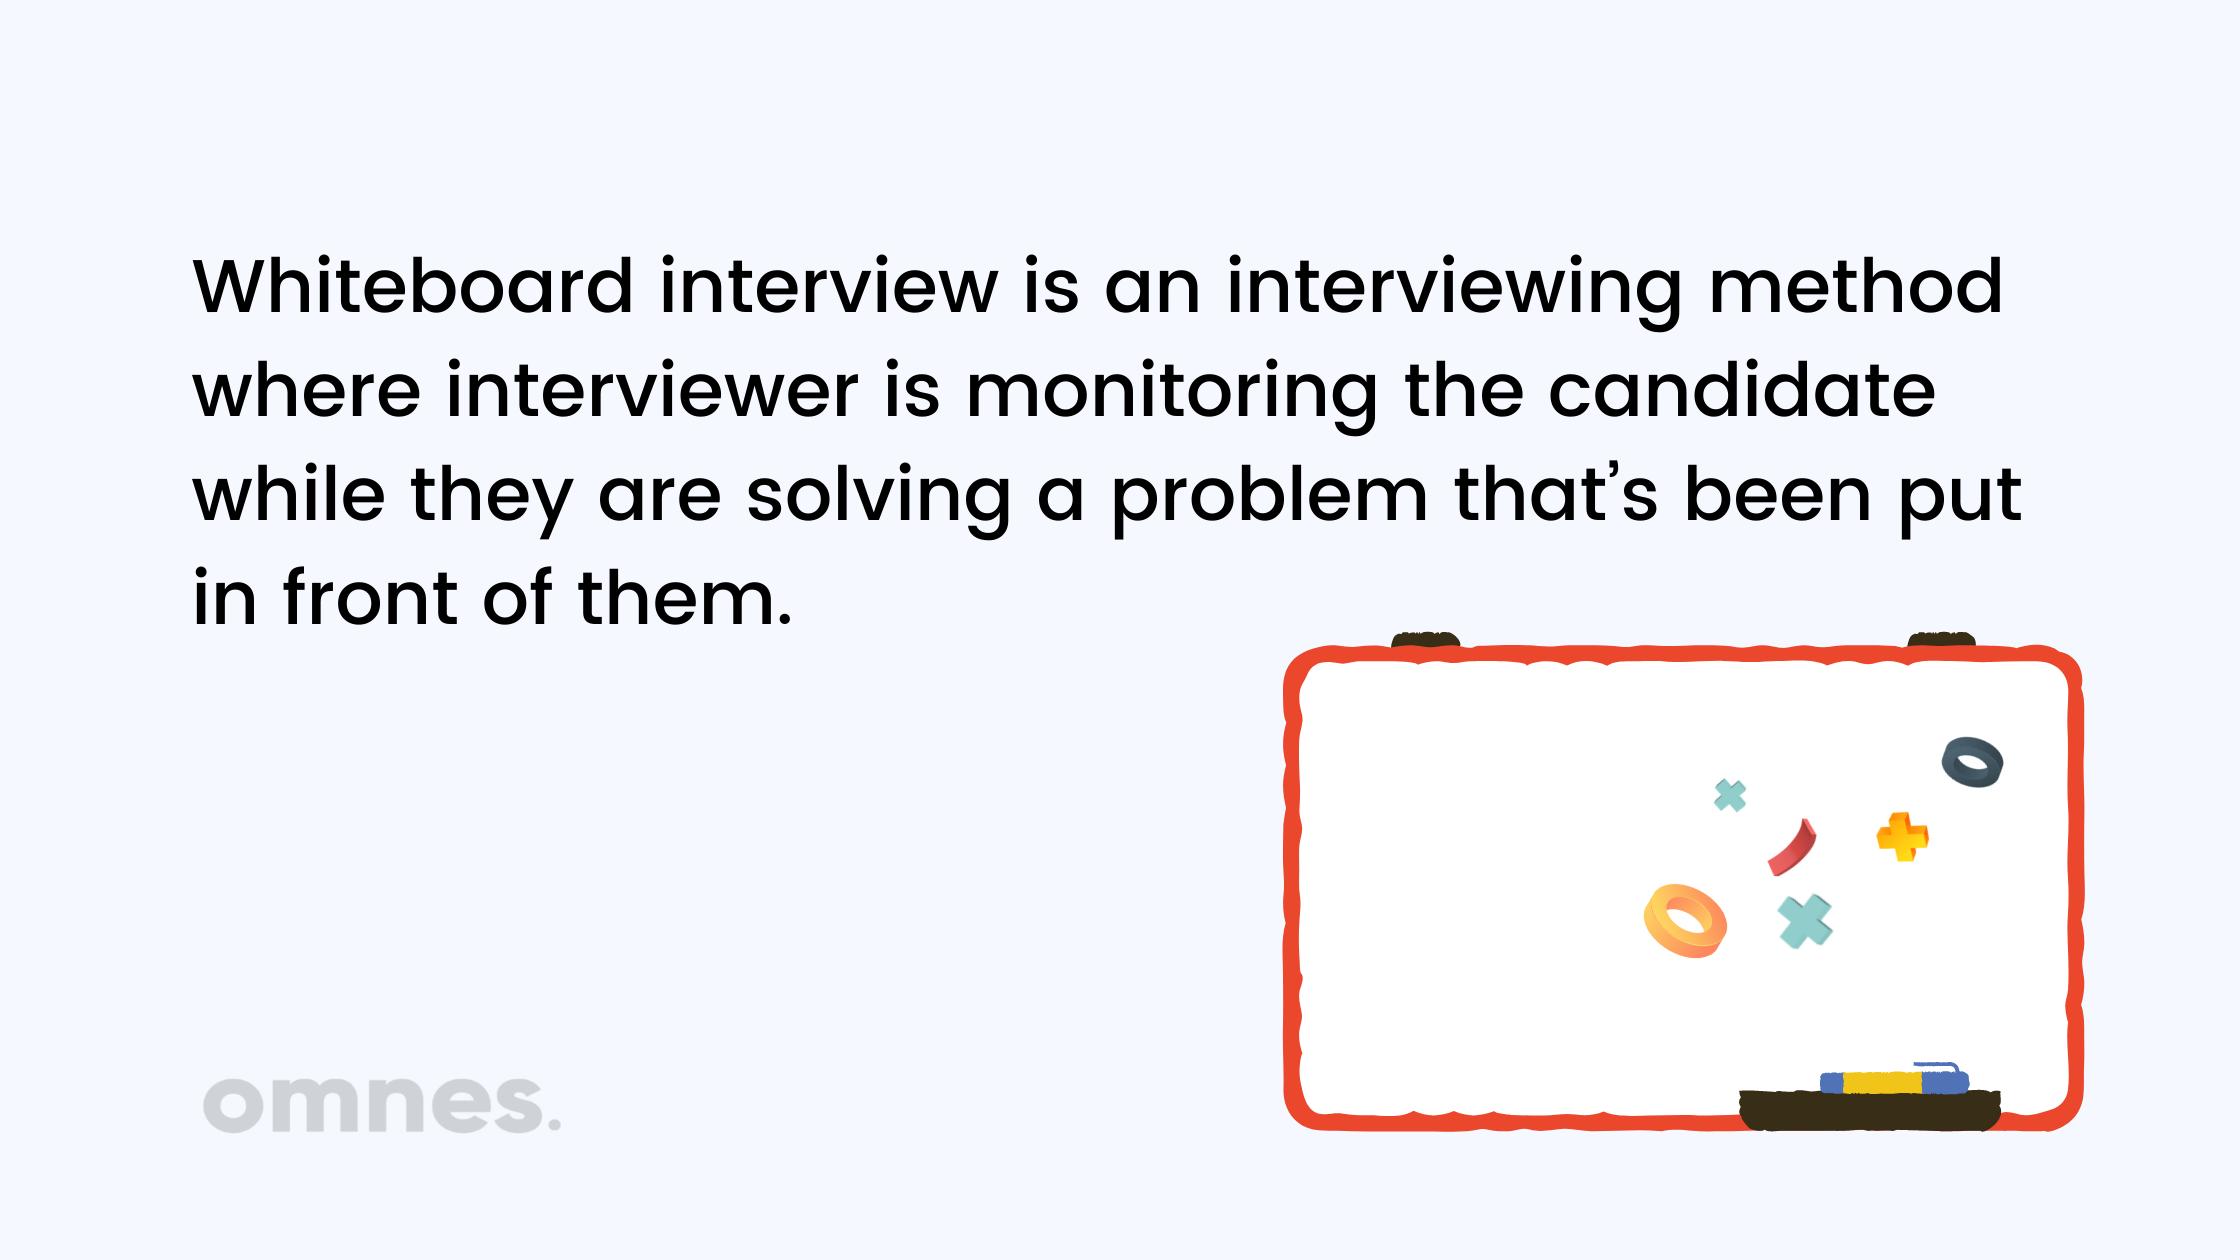 whiteboard interview